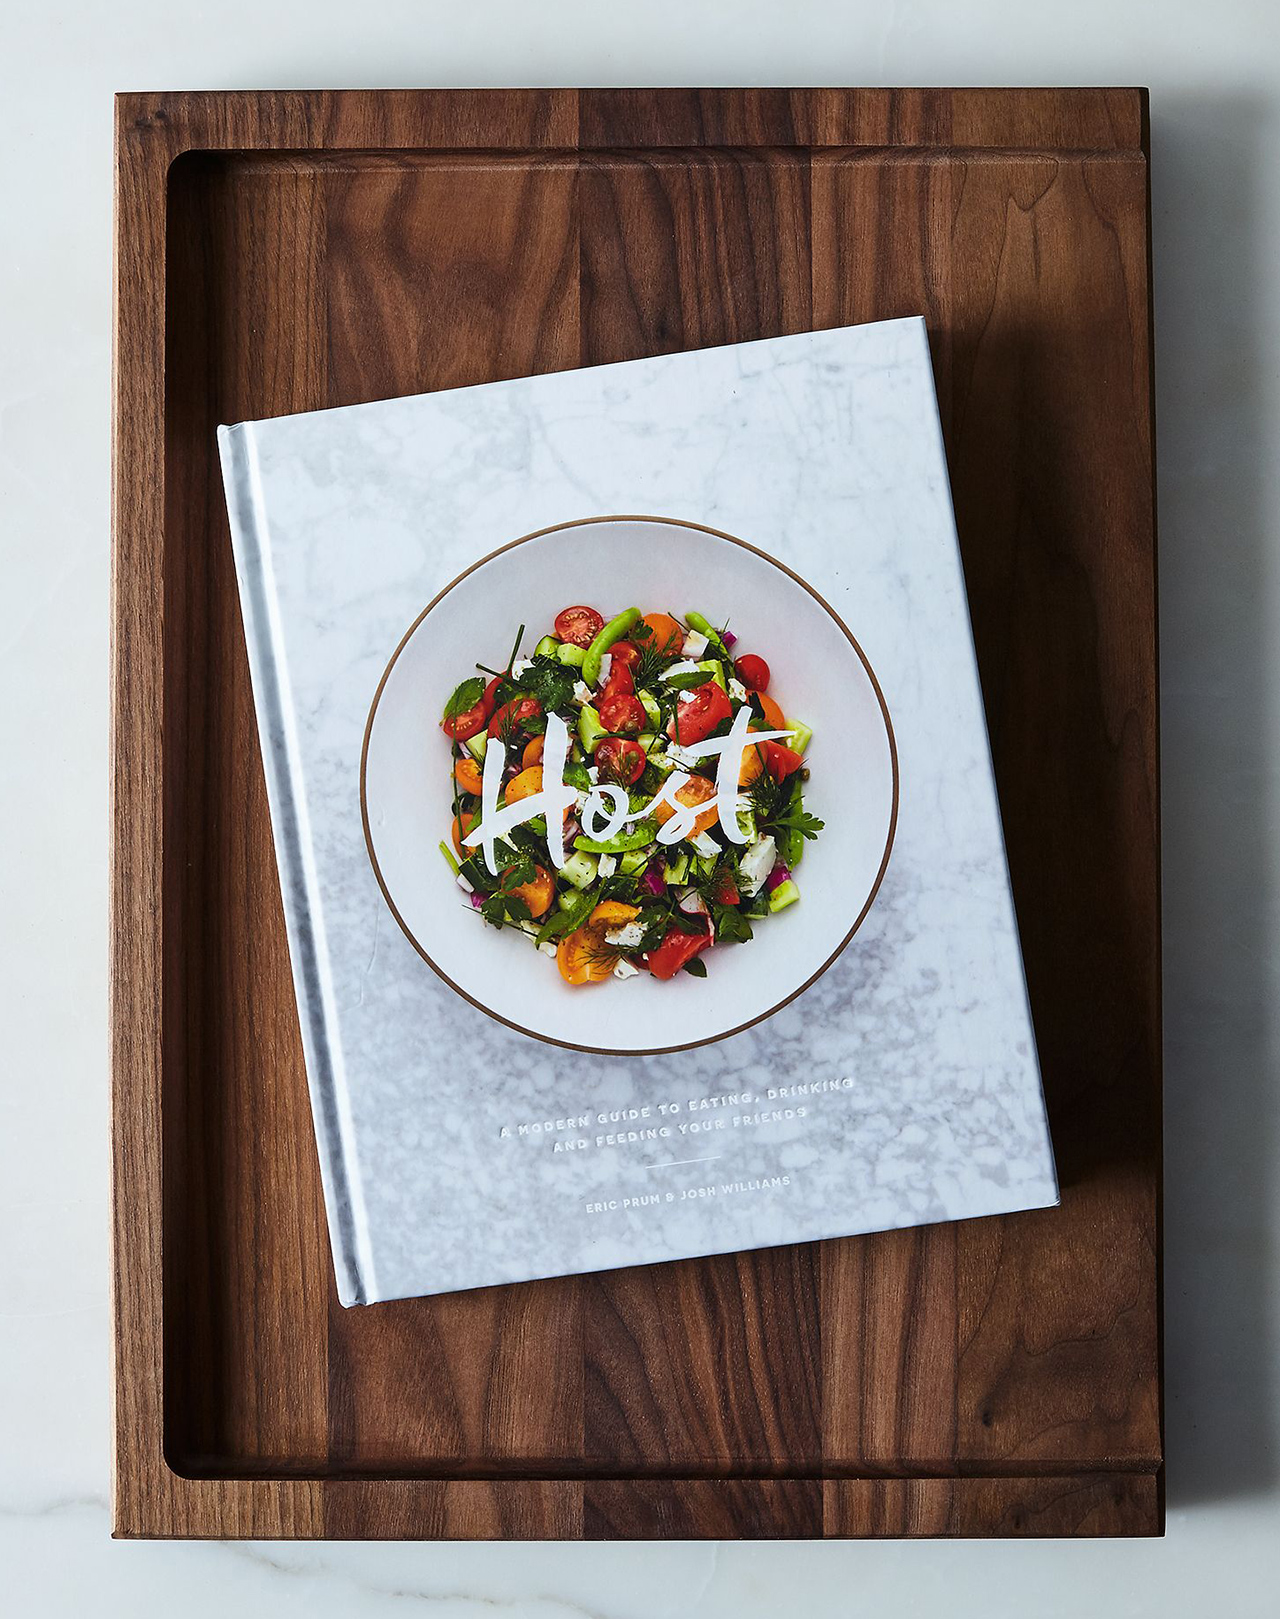 w&p host cookbook and walnut cutting board